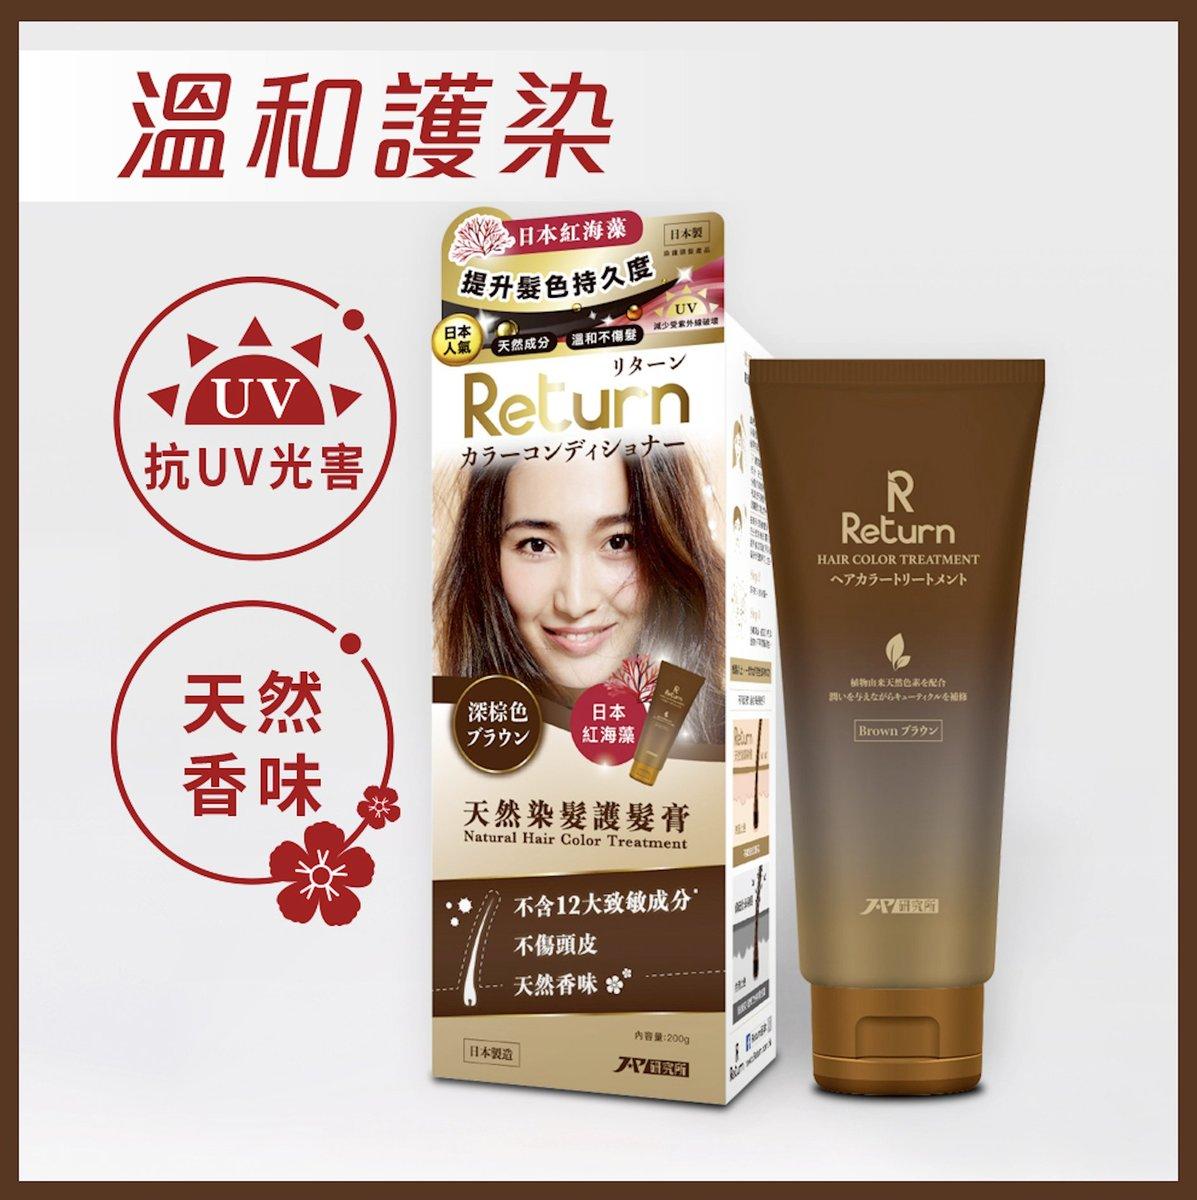 Natural Hair Color Treatment (Brown)